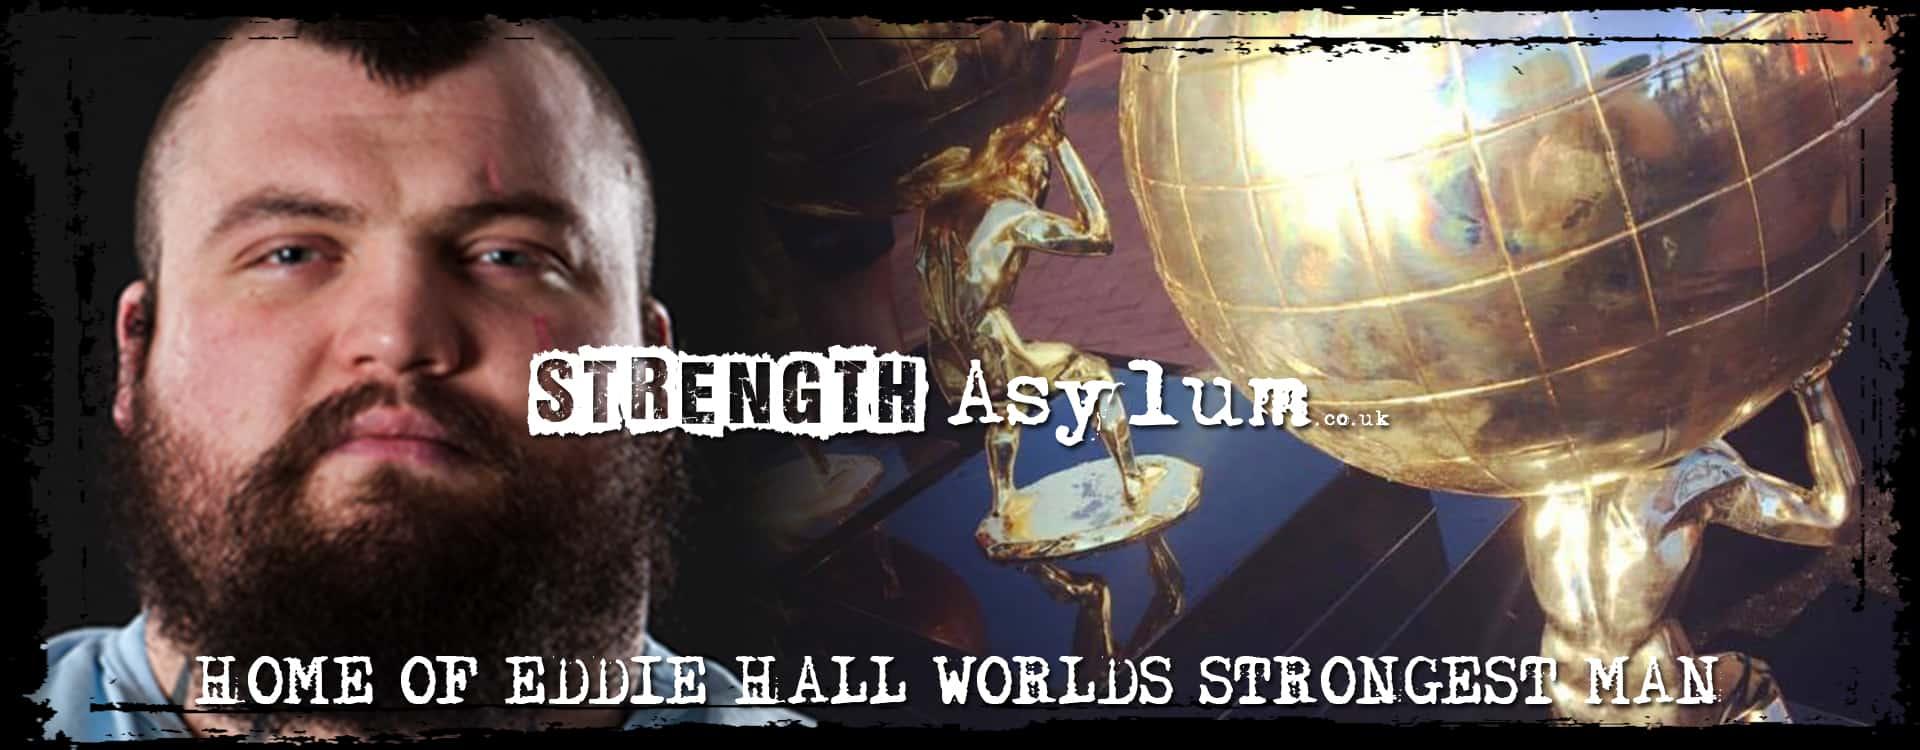 https://www.strengthasylum.co.uk/wp-content/uploads/2017/06/eddie-wsm-2017-banner.jpg